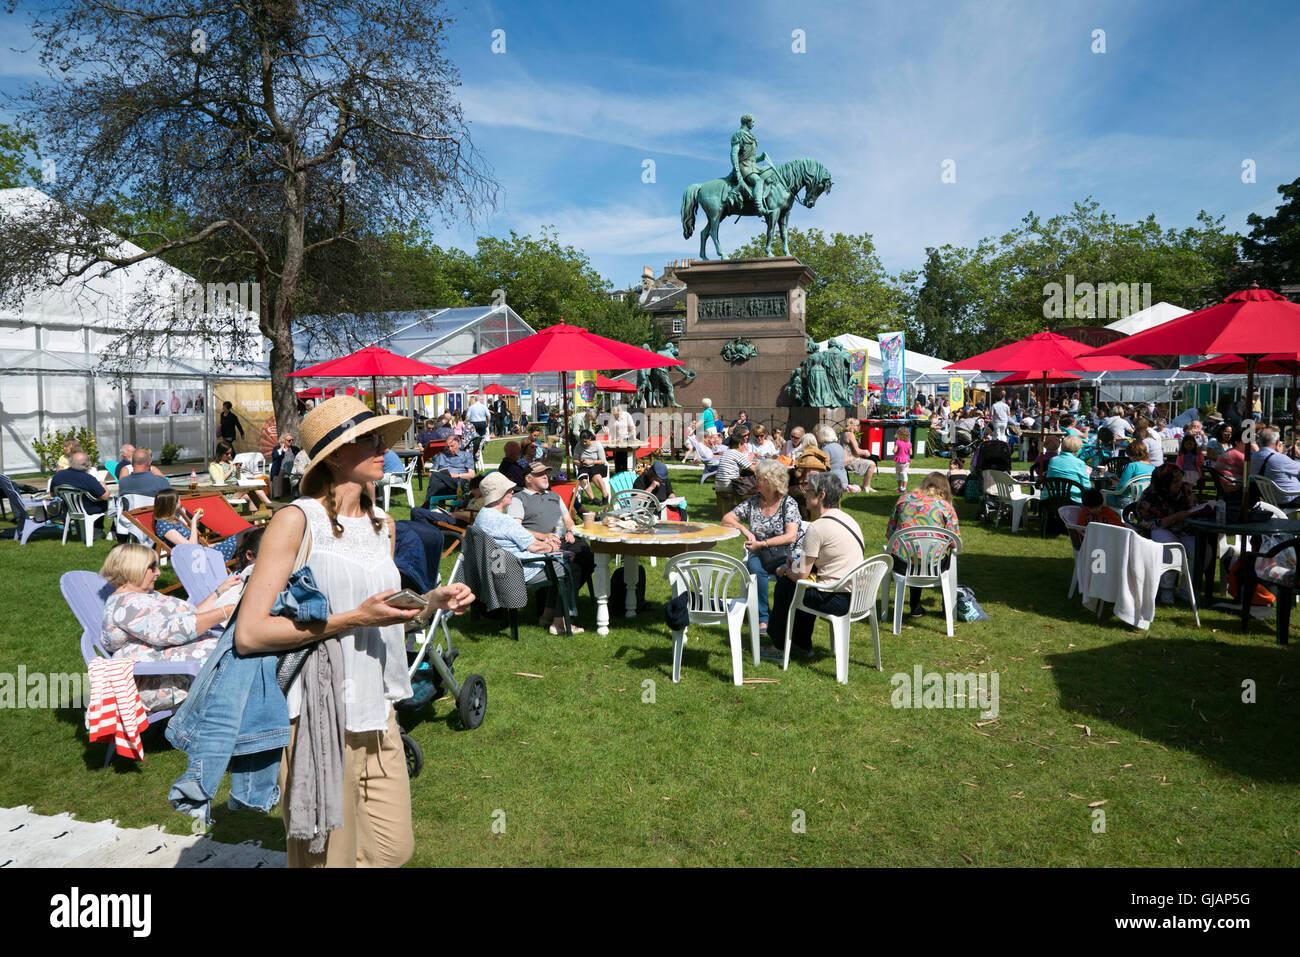 Visitors to the annual Edinburgh Book Festival enjoying the sunshine in Charlotte Square. - Stock Image